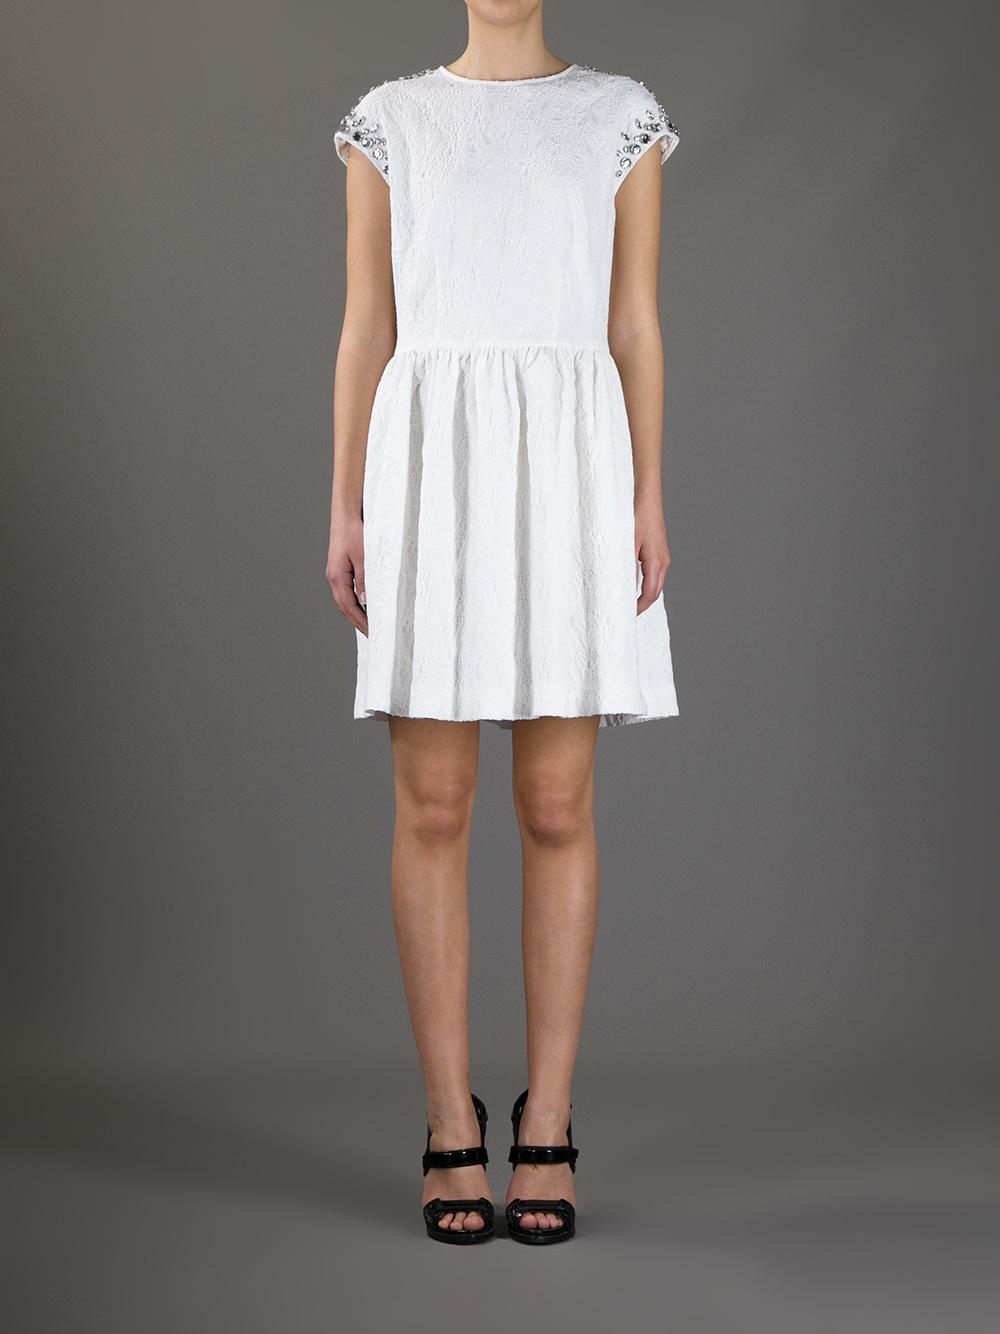 Msgm white lace dress.